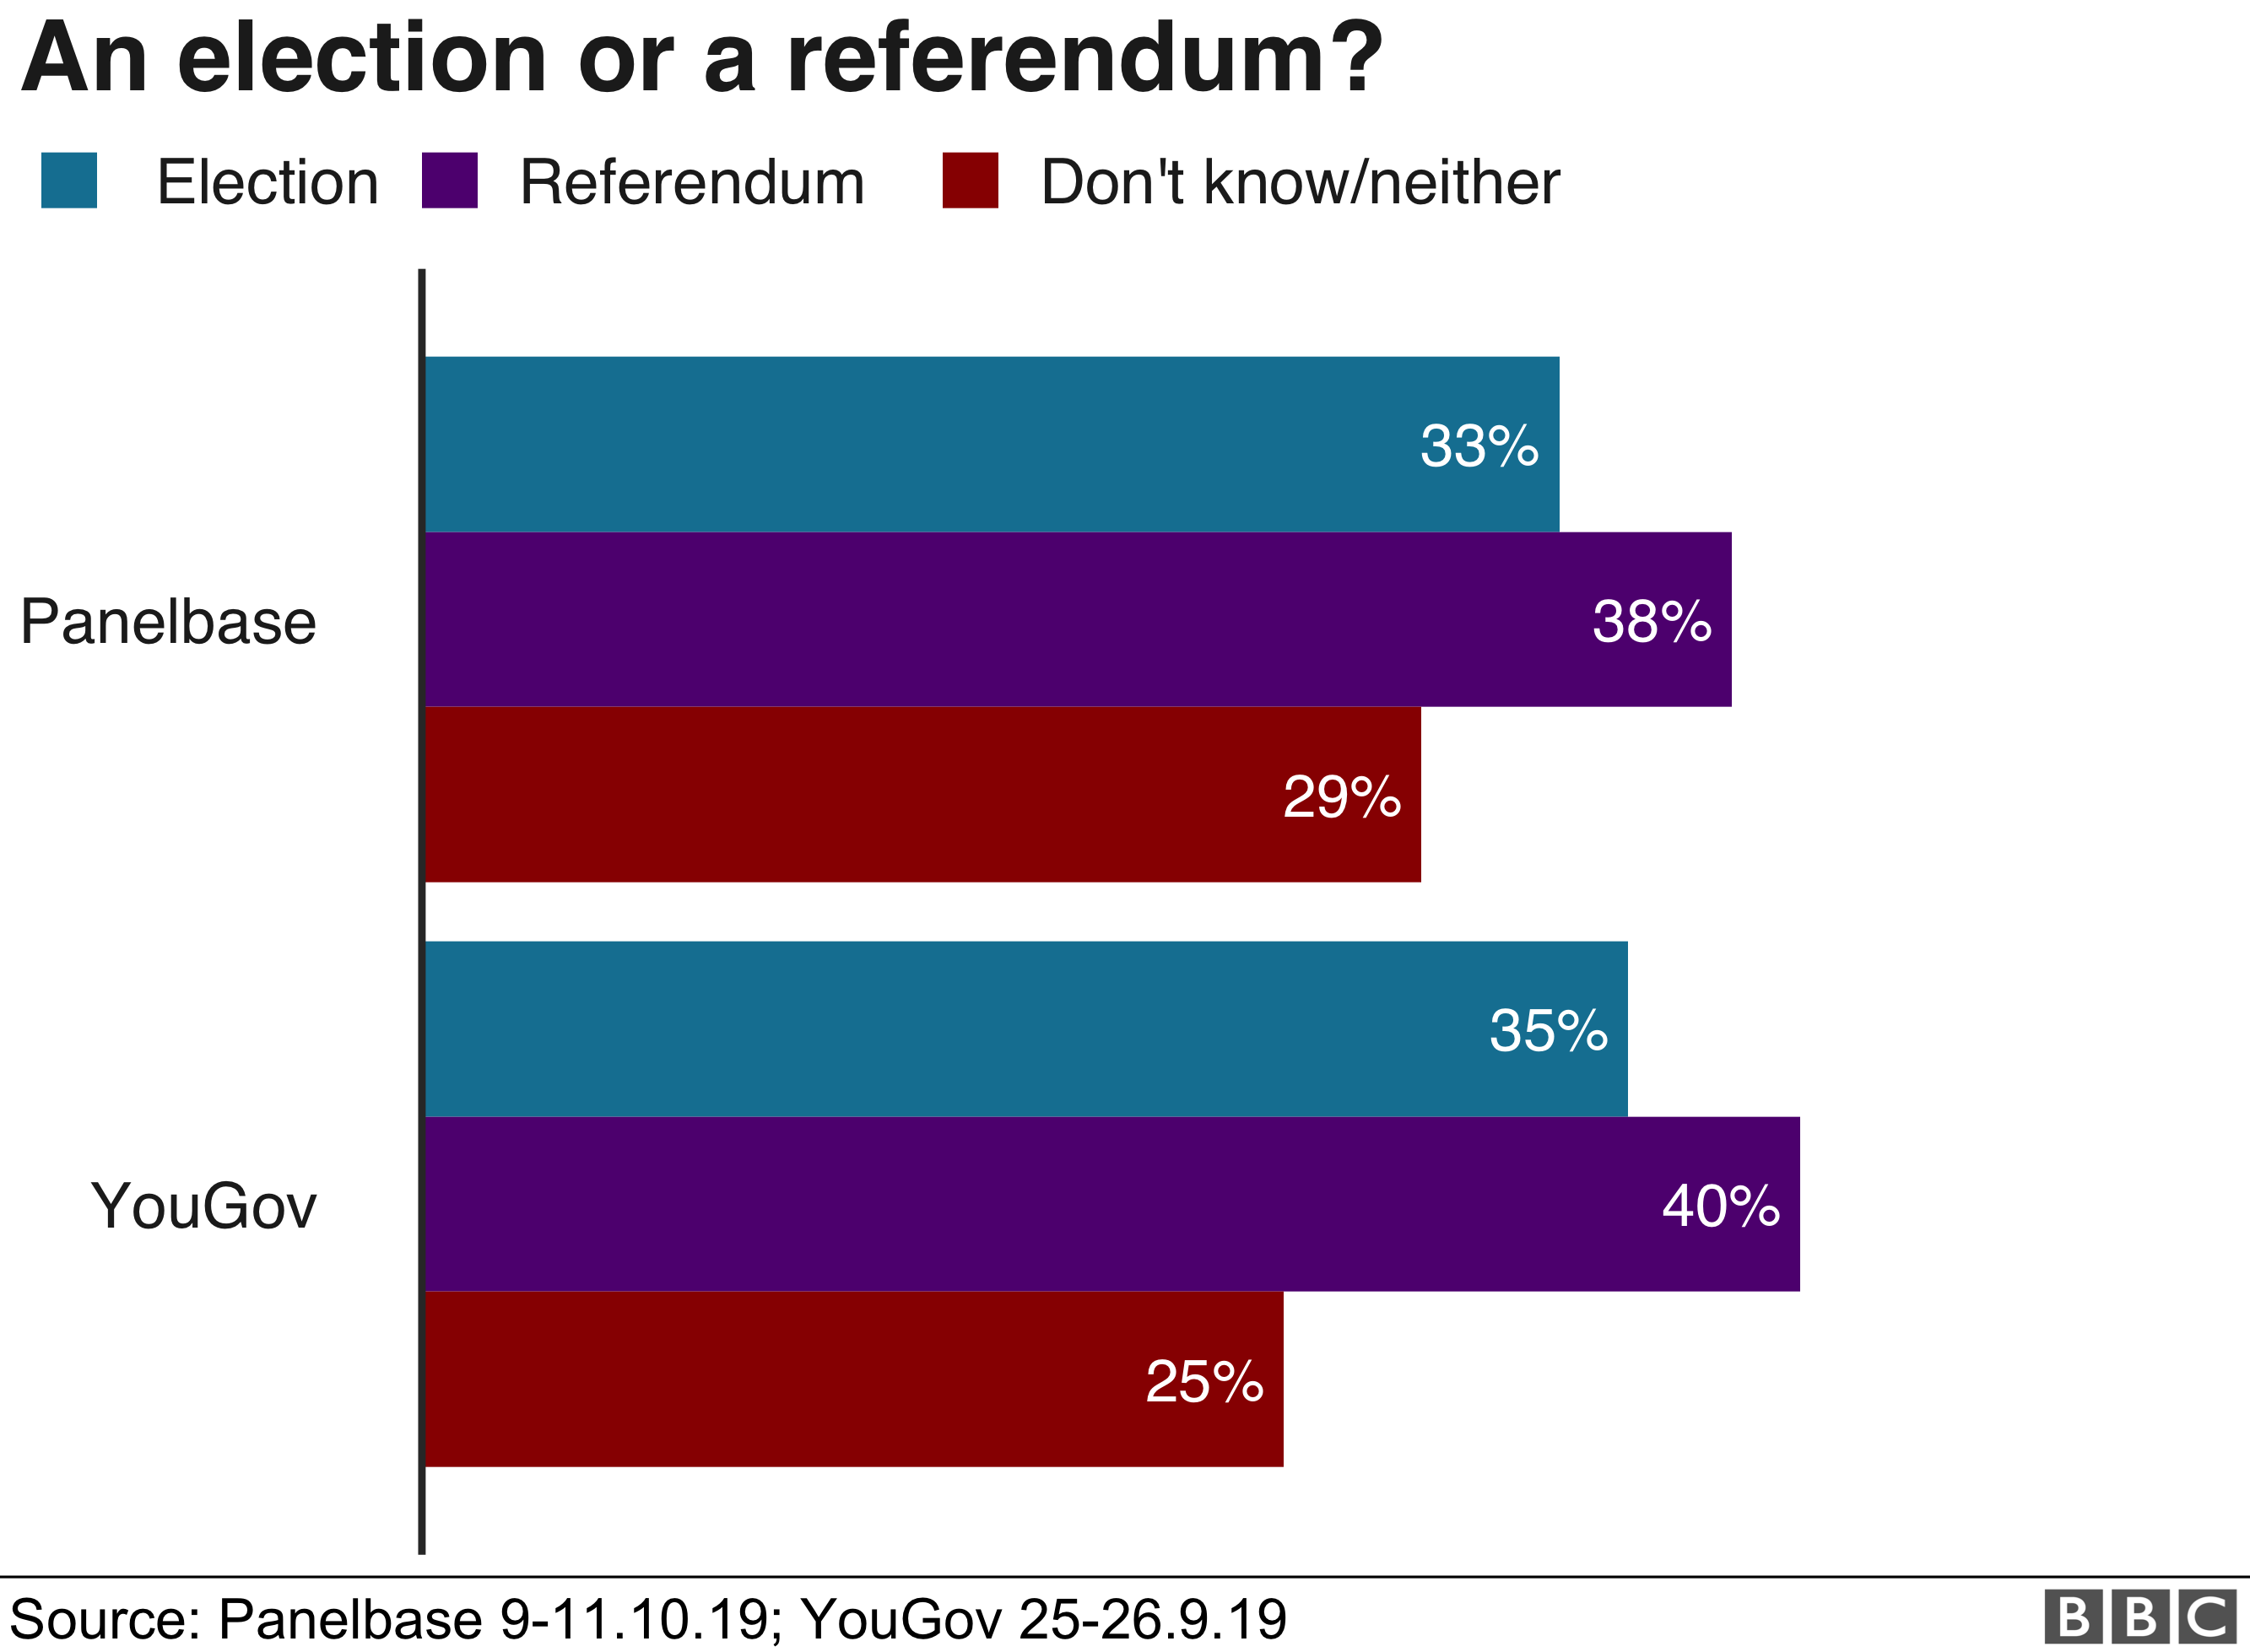 Attitudes towards an election or a referendum